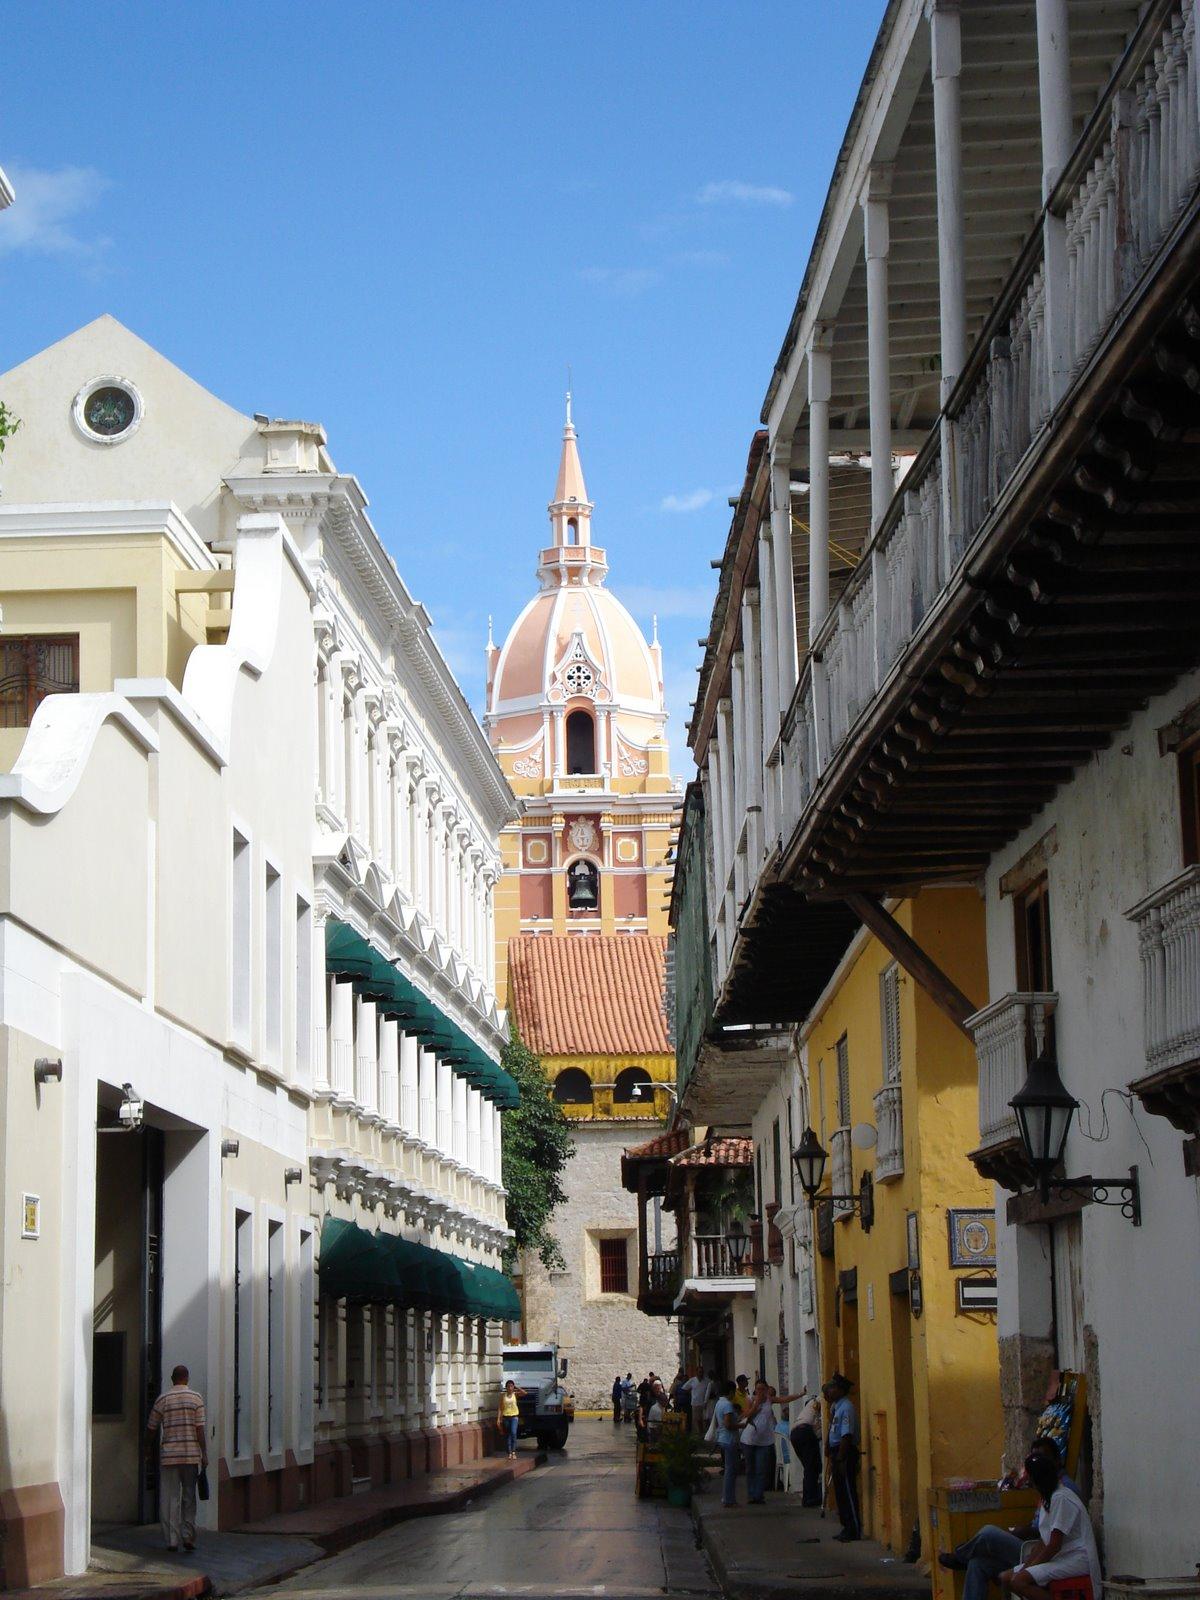 Yo Que Camino Cojo, Que Camino Cojo?: Cartagena, Santa